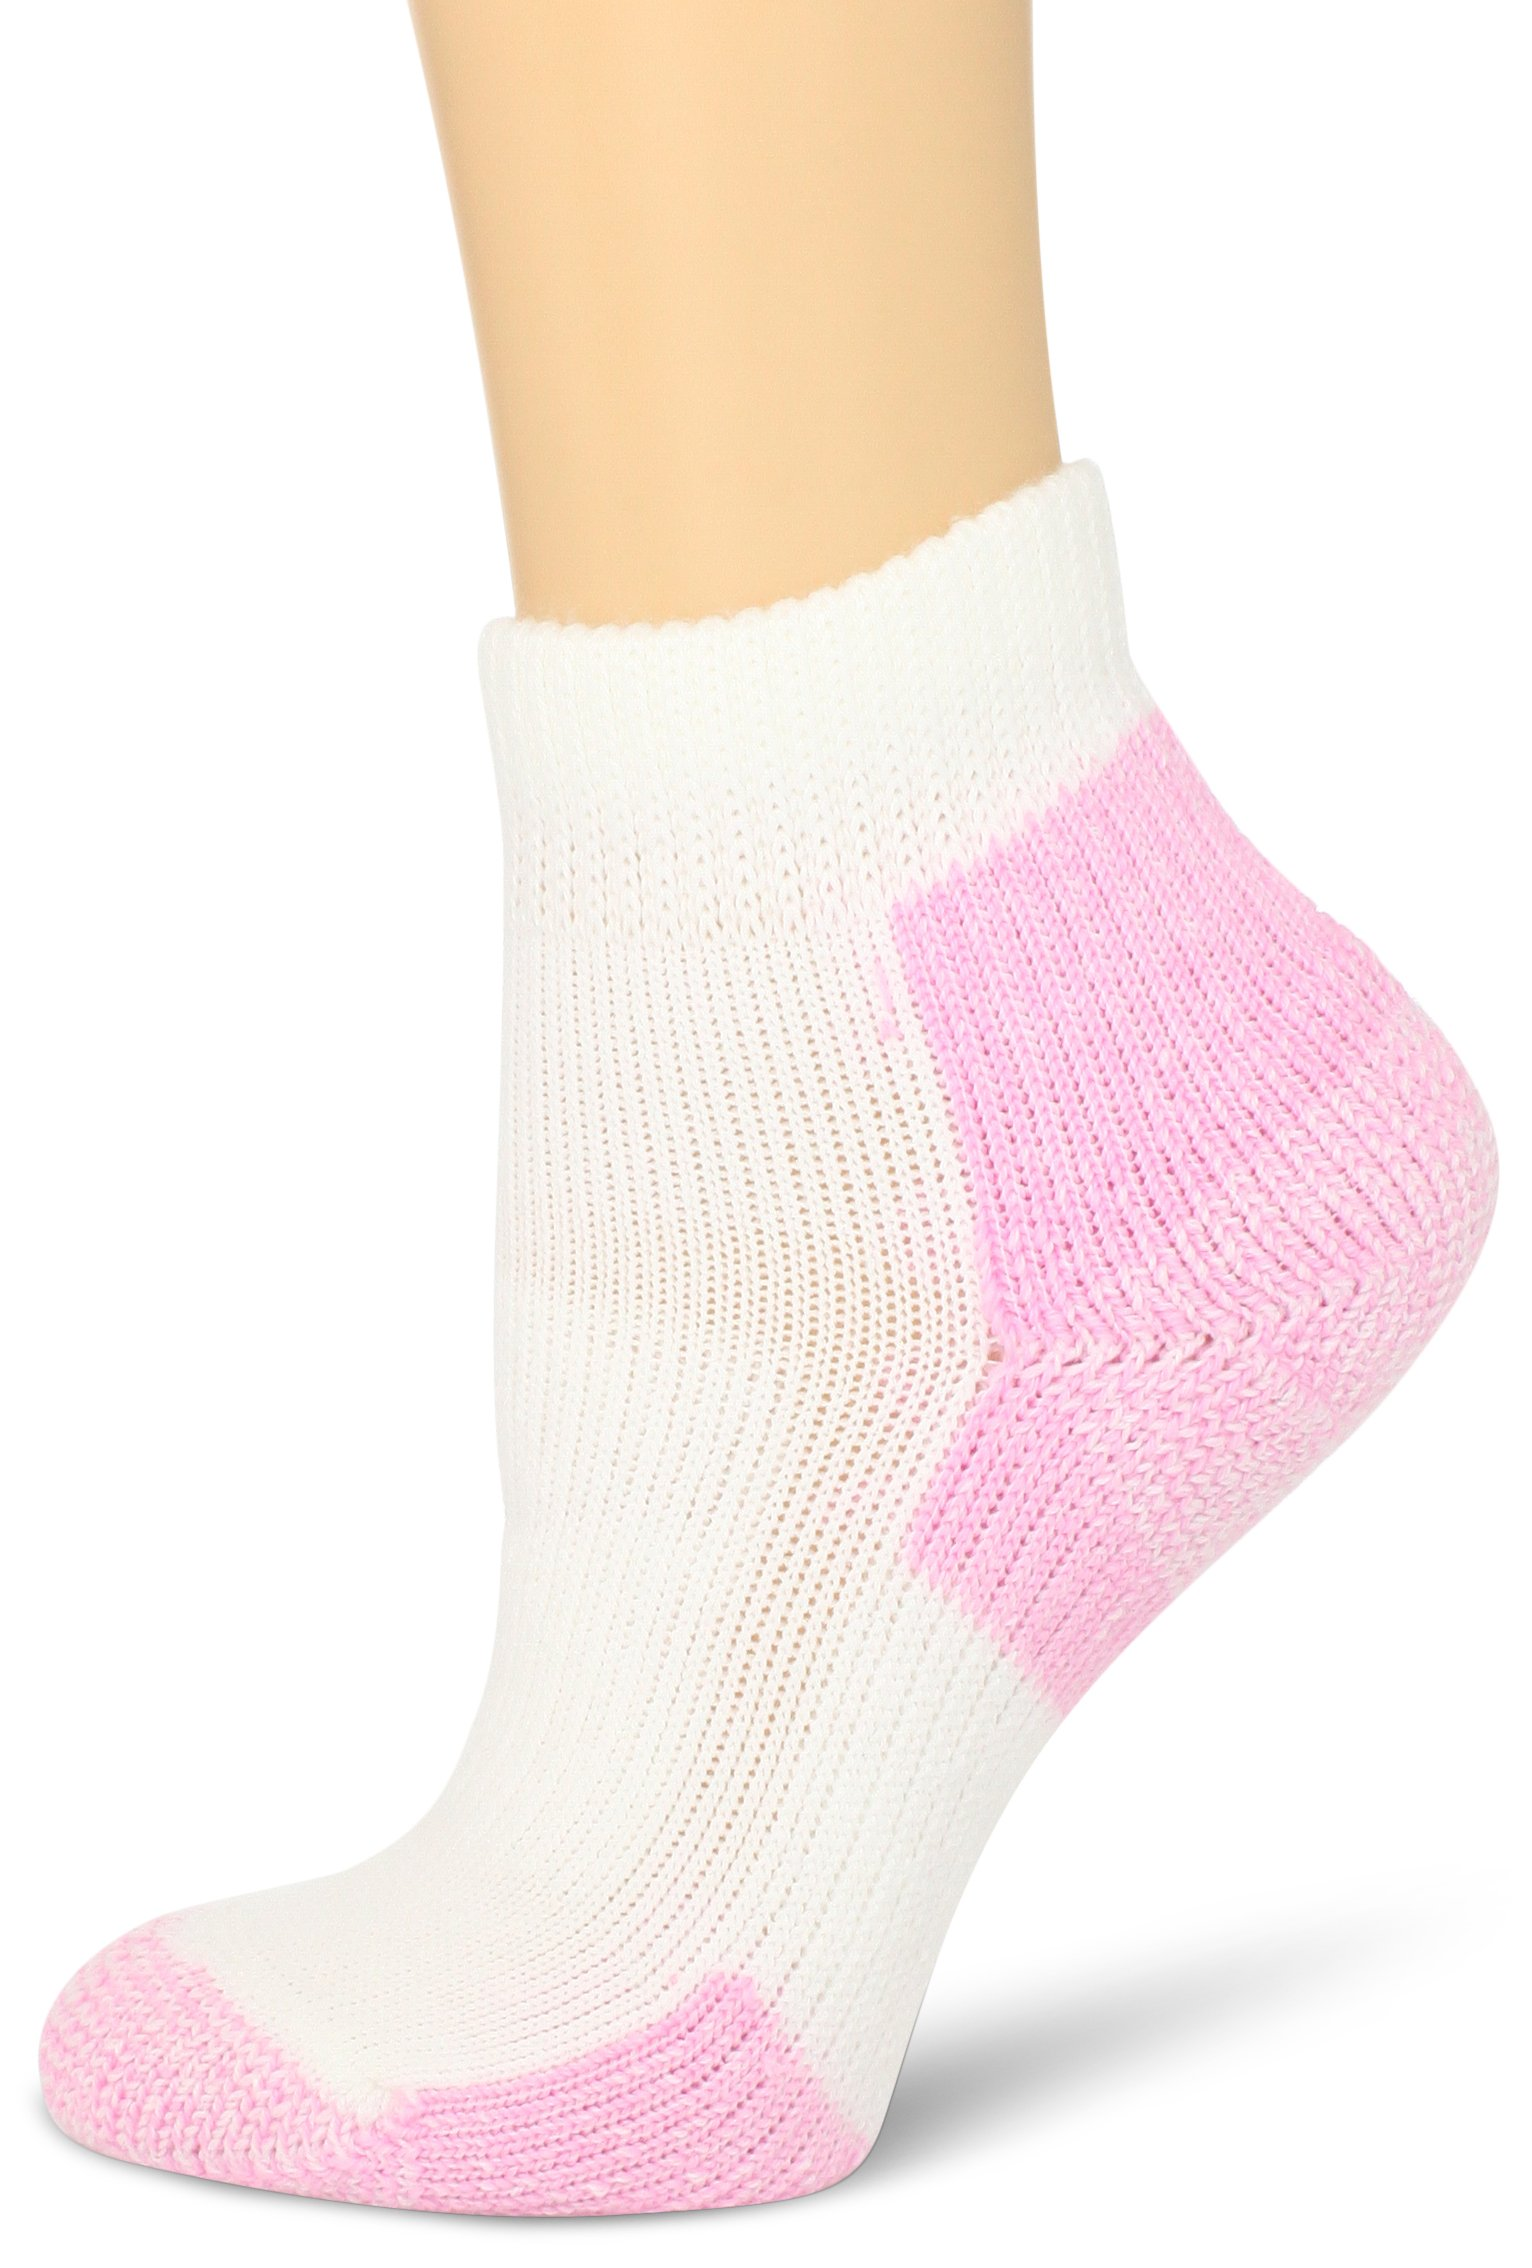 Thorlos Women's DWMXW Walking Thick Padded Ankle Sock, Pink, Large